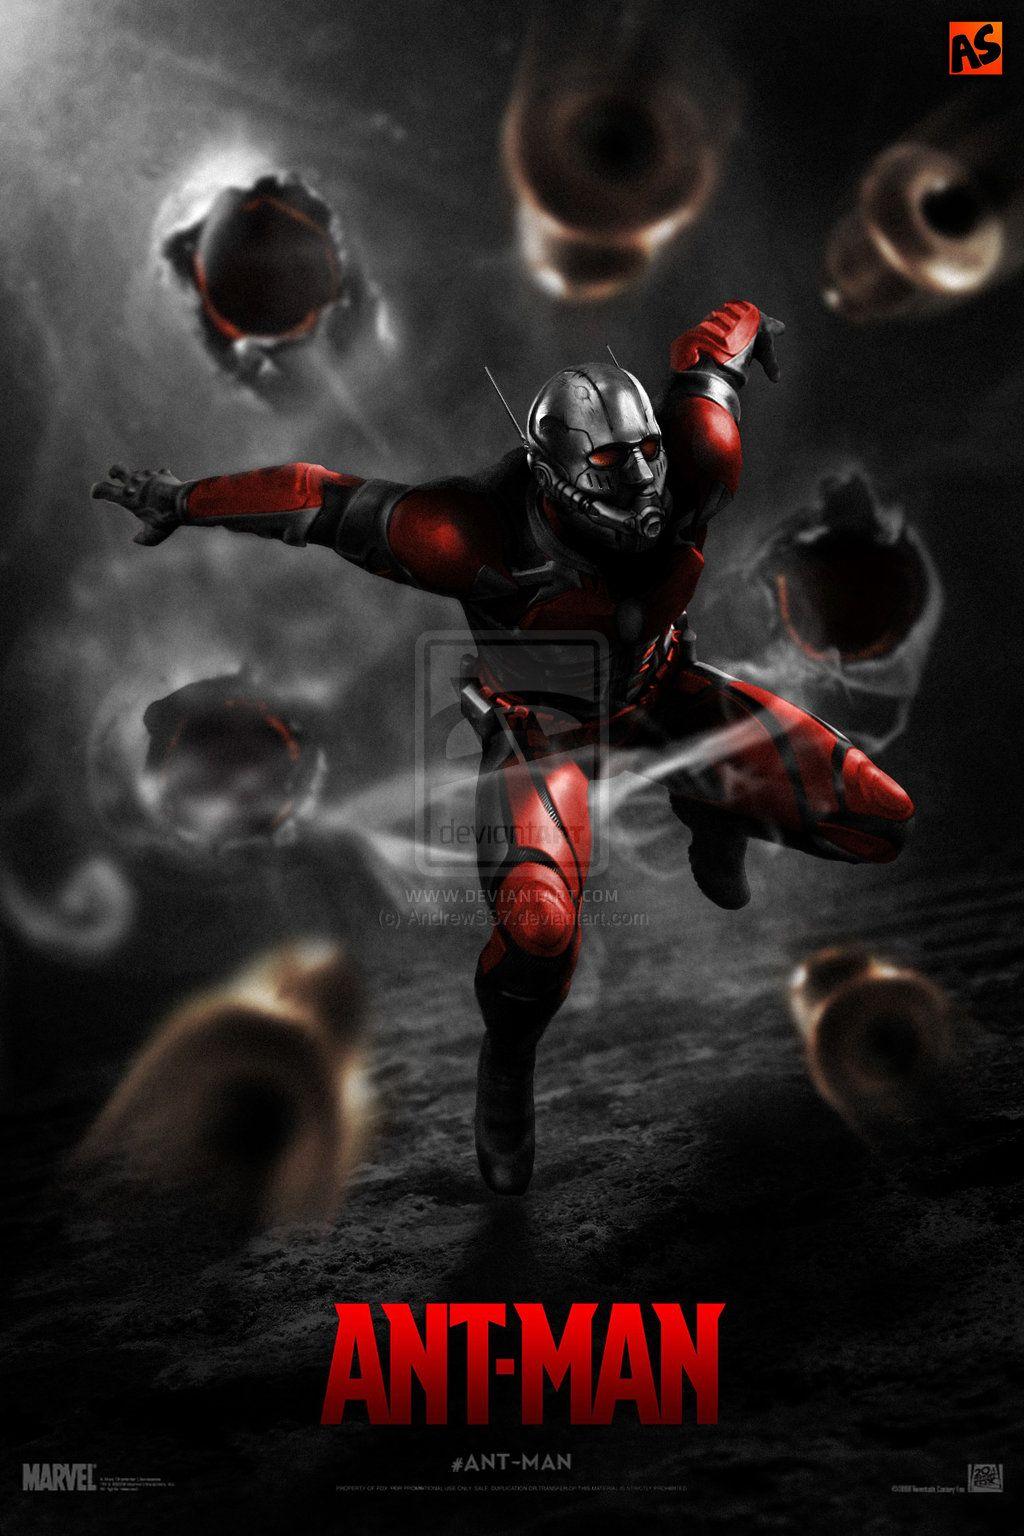 ANT-MAN (teaser) poster by AndrewSS7.deviantart.com on @deviantART